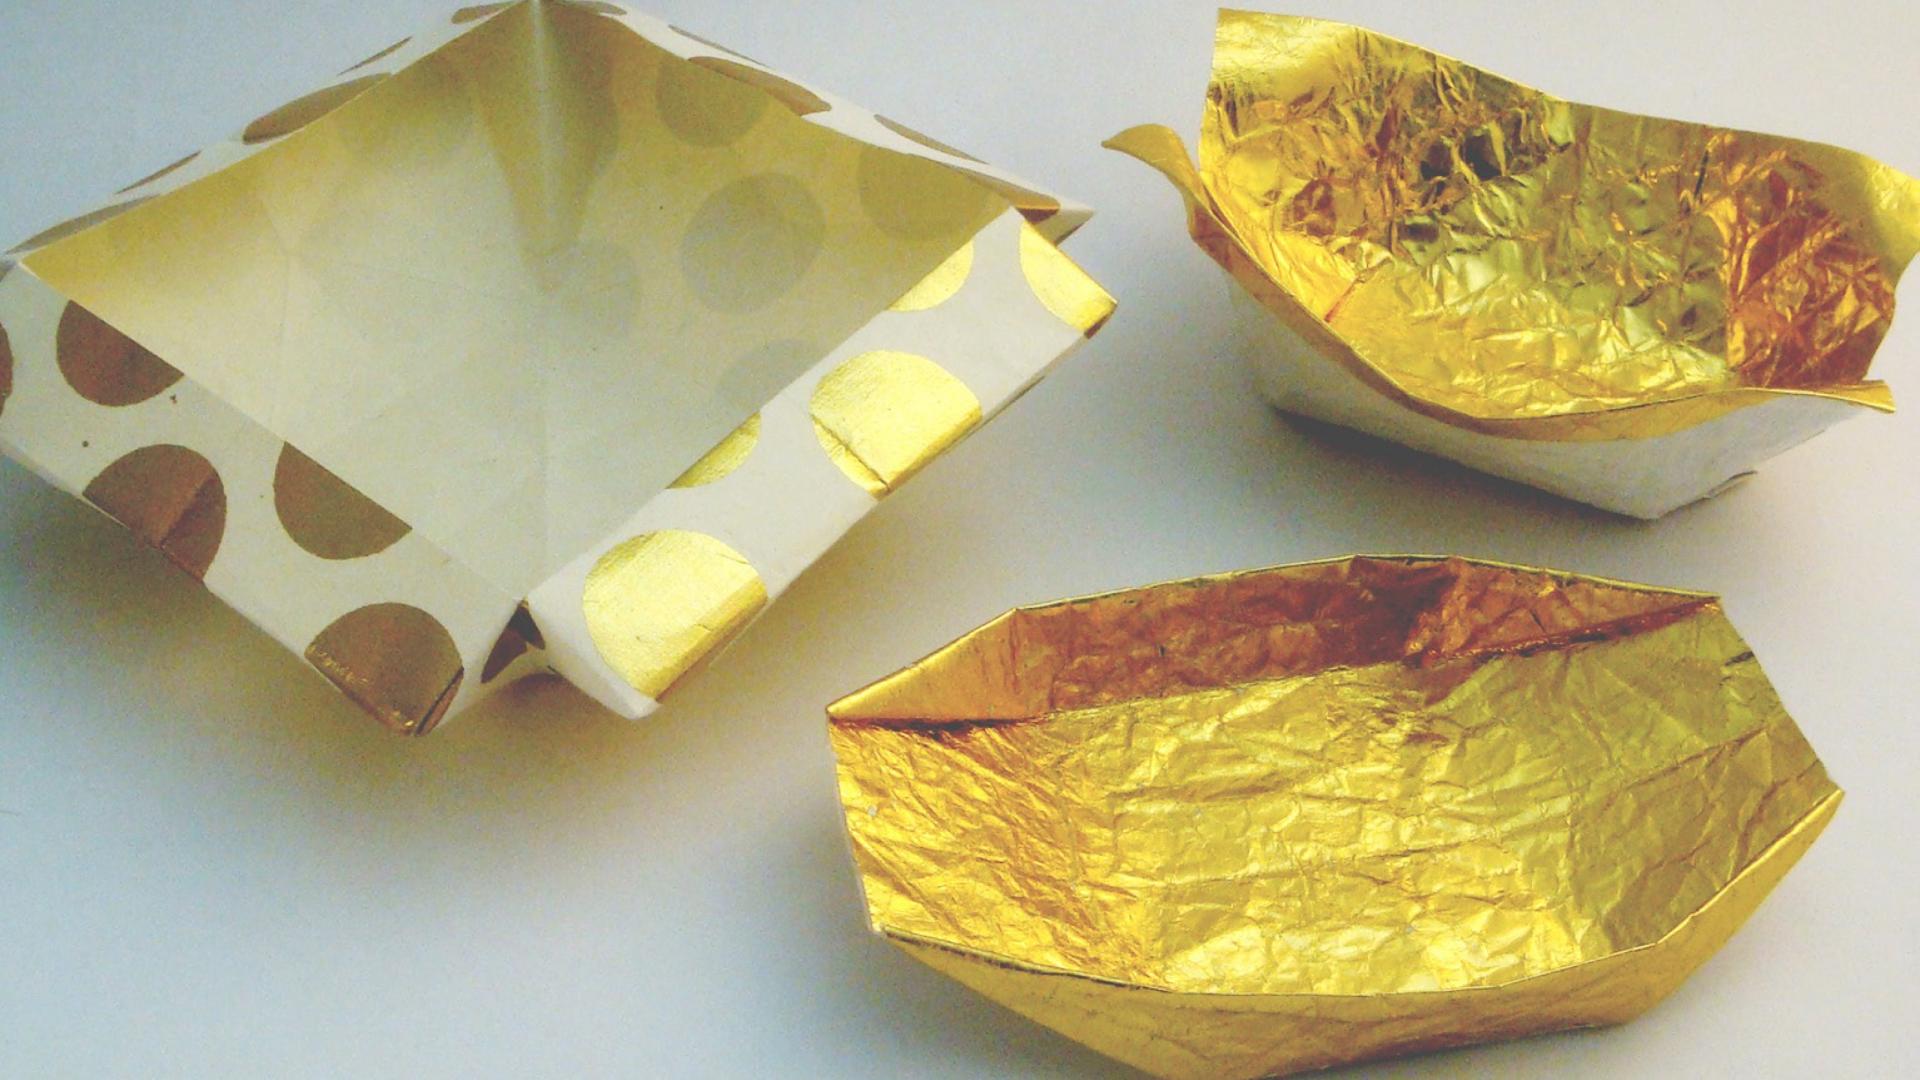 Origami Workshop 3 Origami Bowls